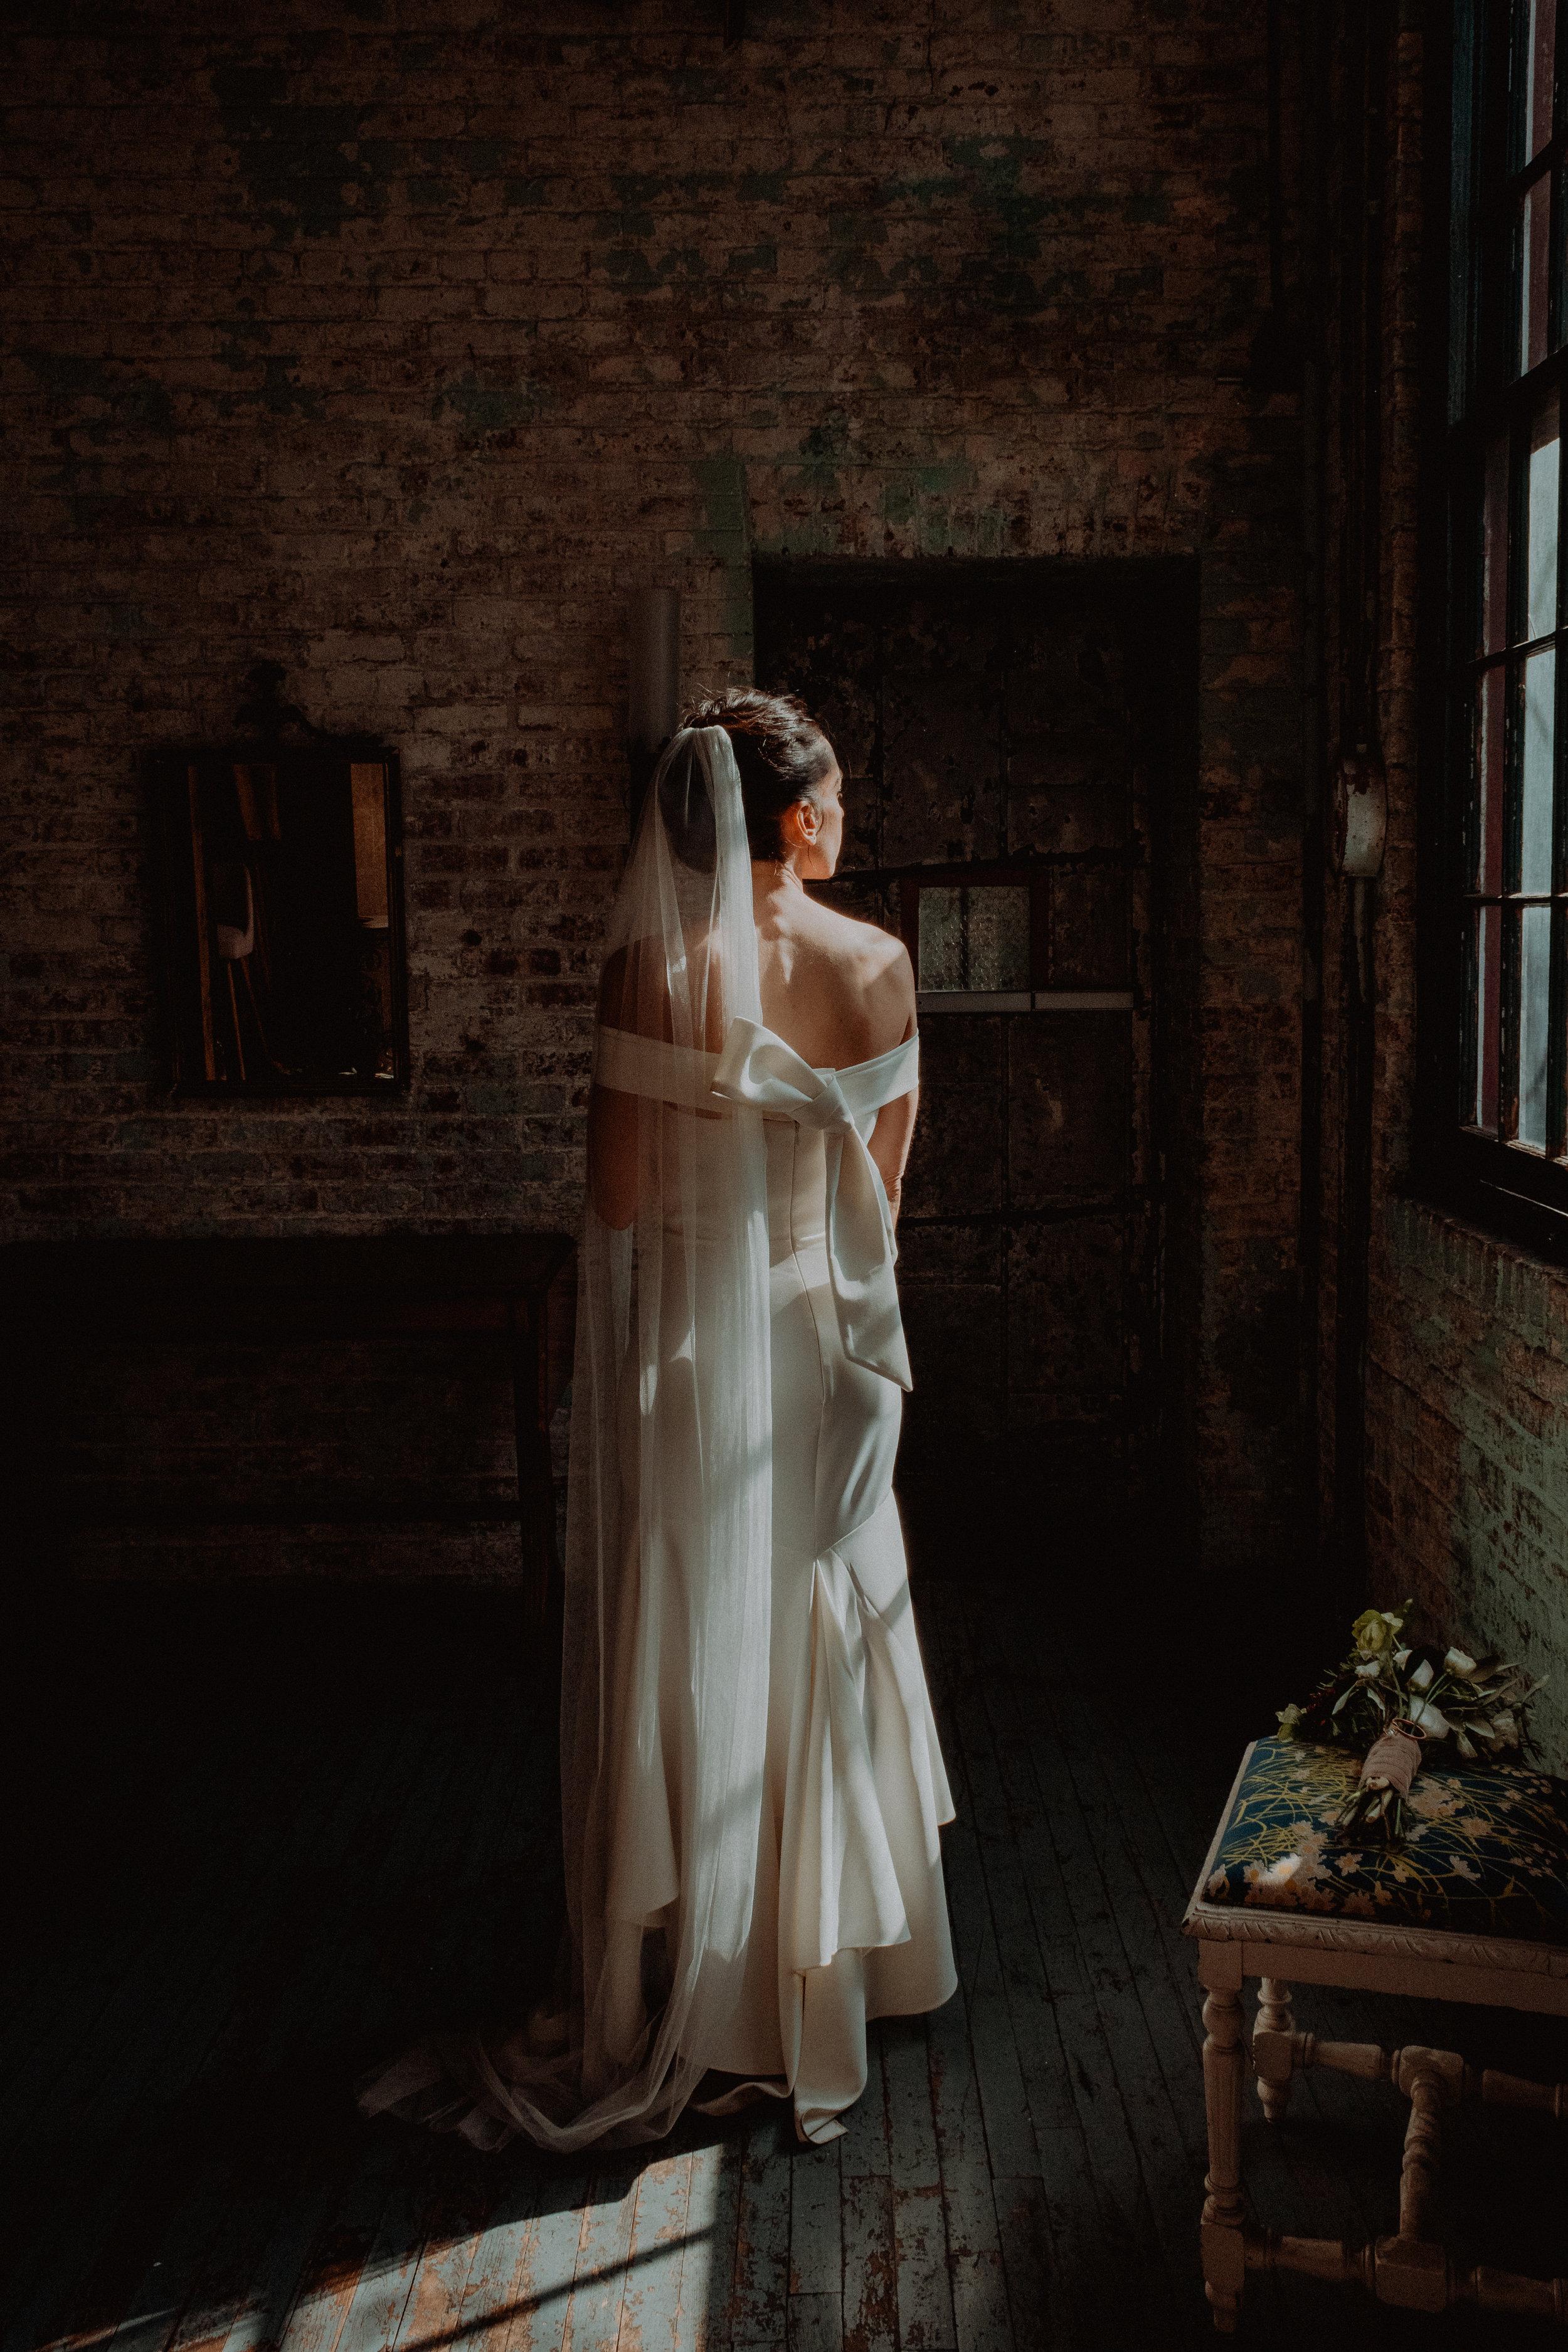 Metropolitan_Building_Wedding_DemaineandMike_Brooklyn_Wedding_Photographer_Chellise_Michael_Photography-266.jpg